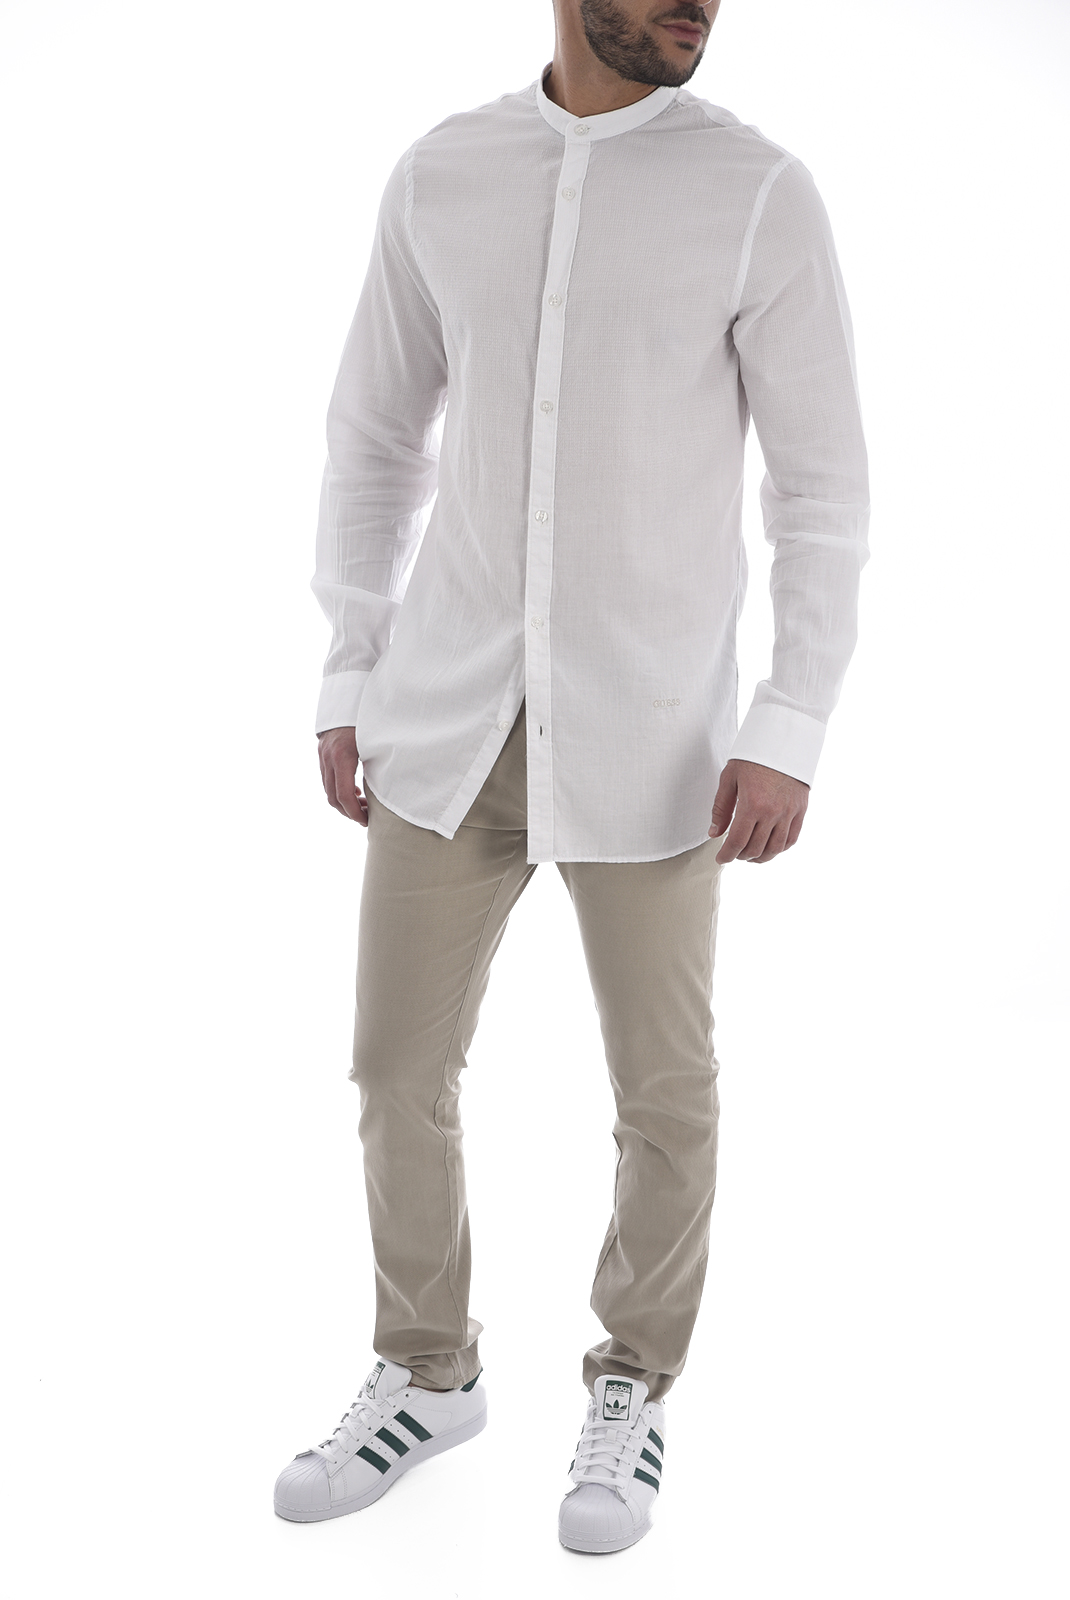 Chemises manches longues  Guess jeans M82H19 W9WT0 F0D5 WHITE